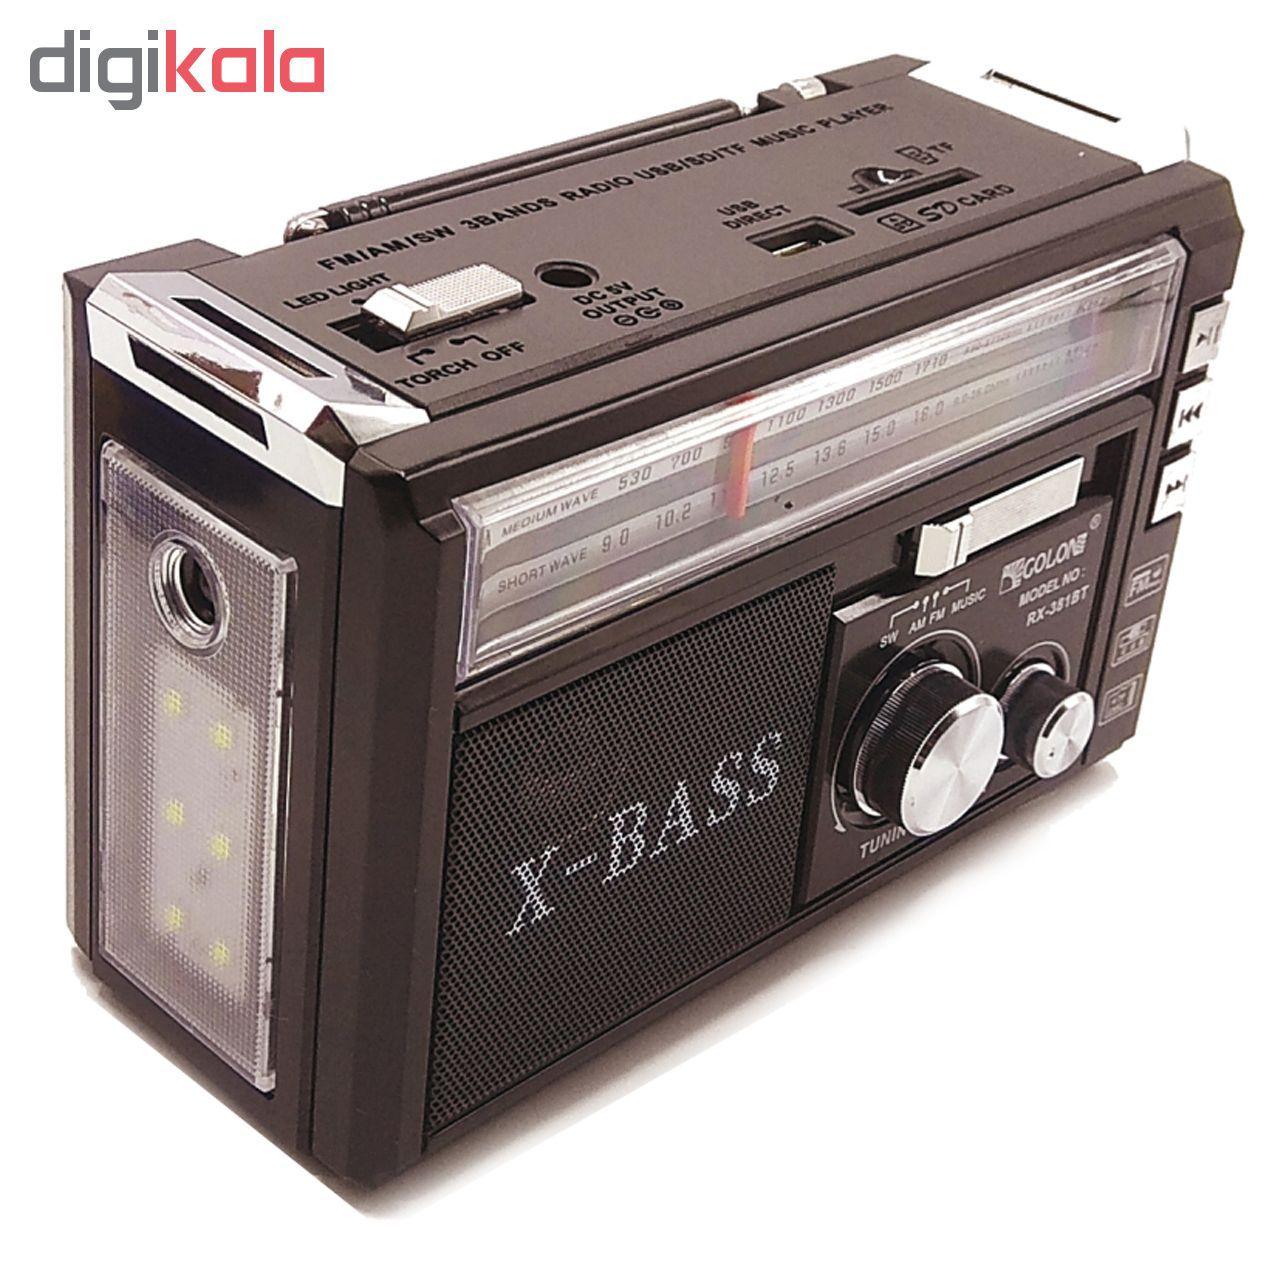 رادیو بلوتوثی گولون مدل RX-381BT main 1 3